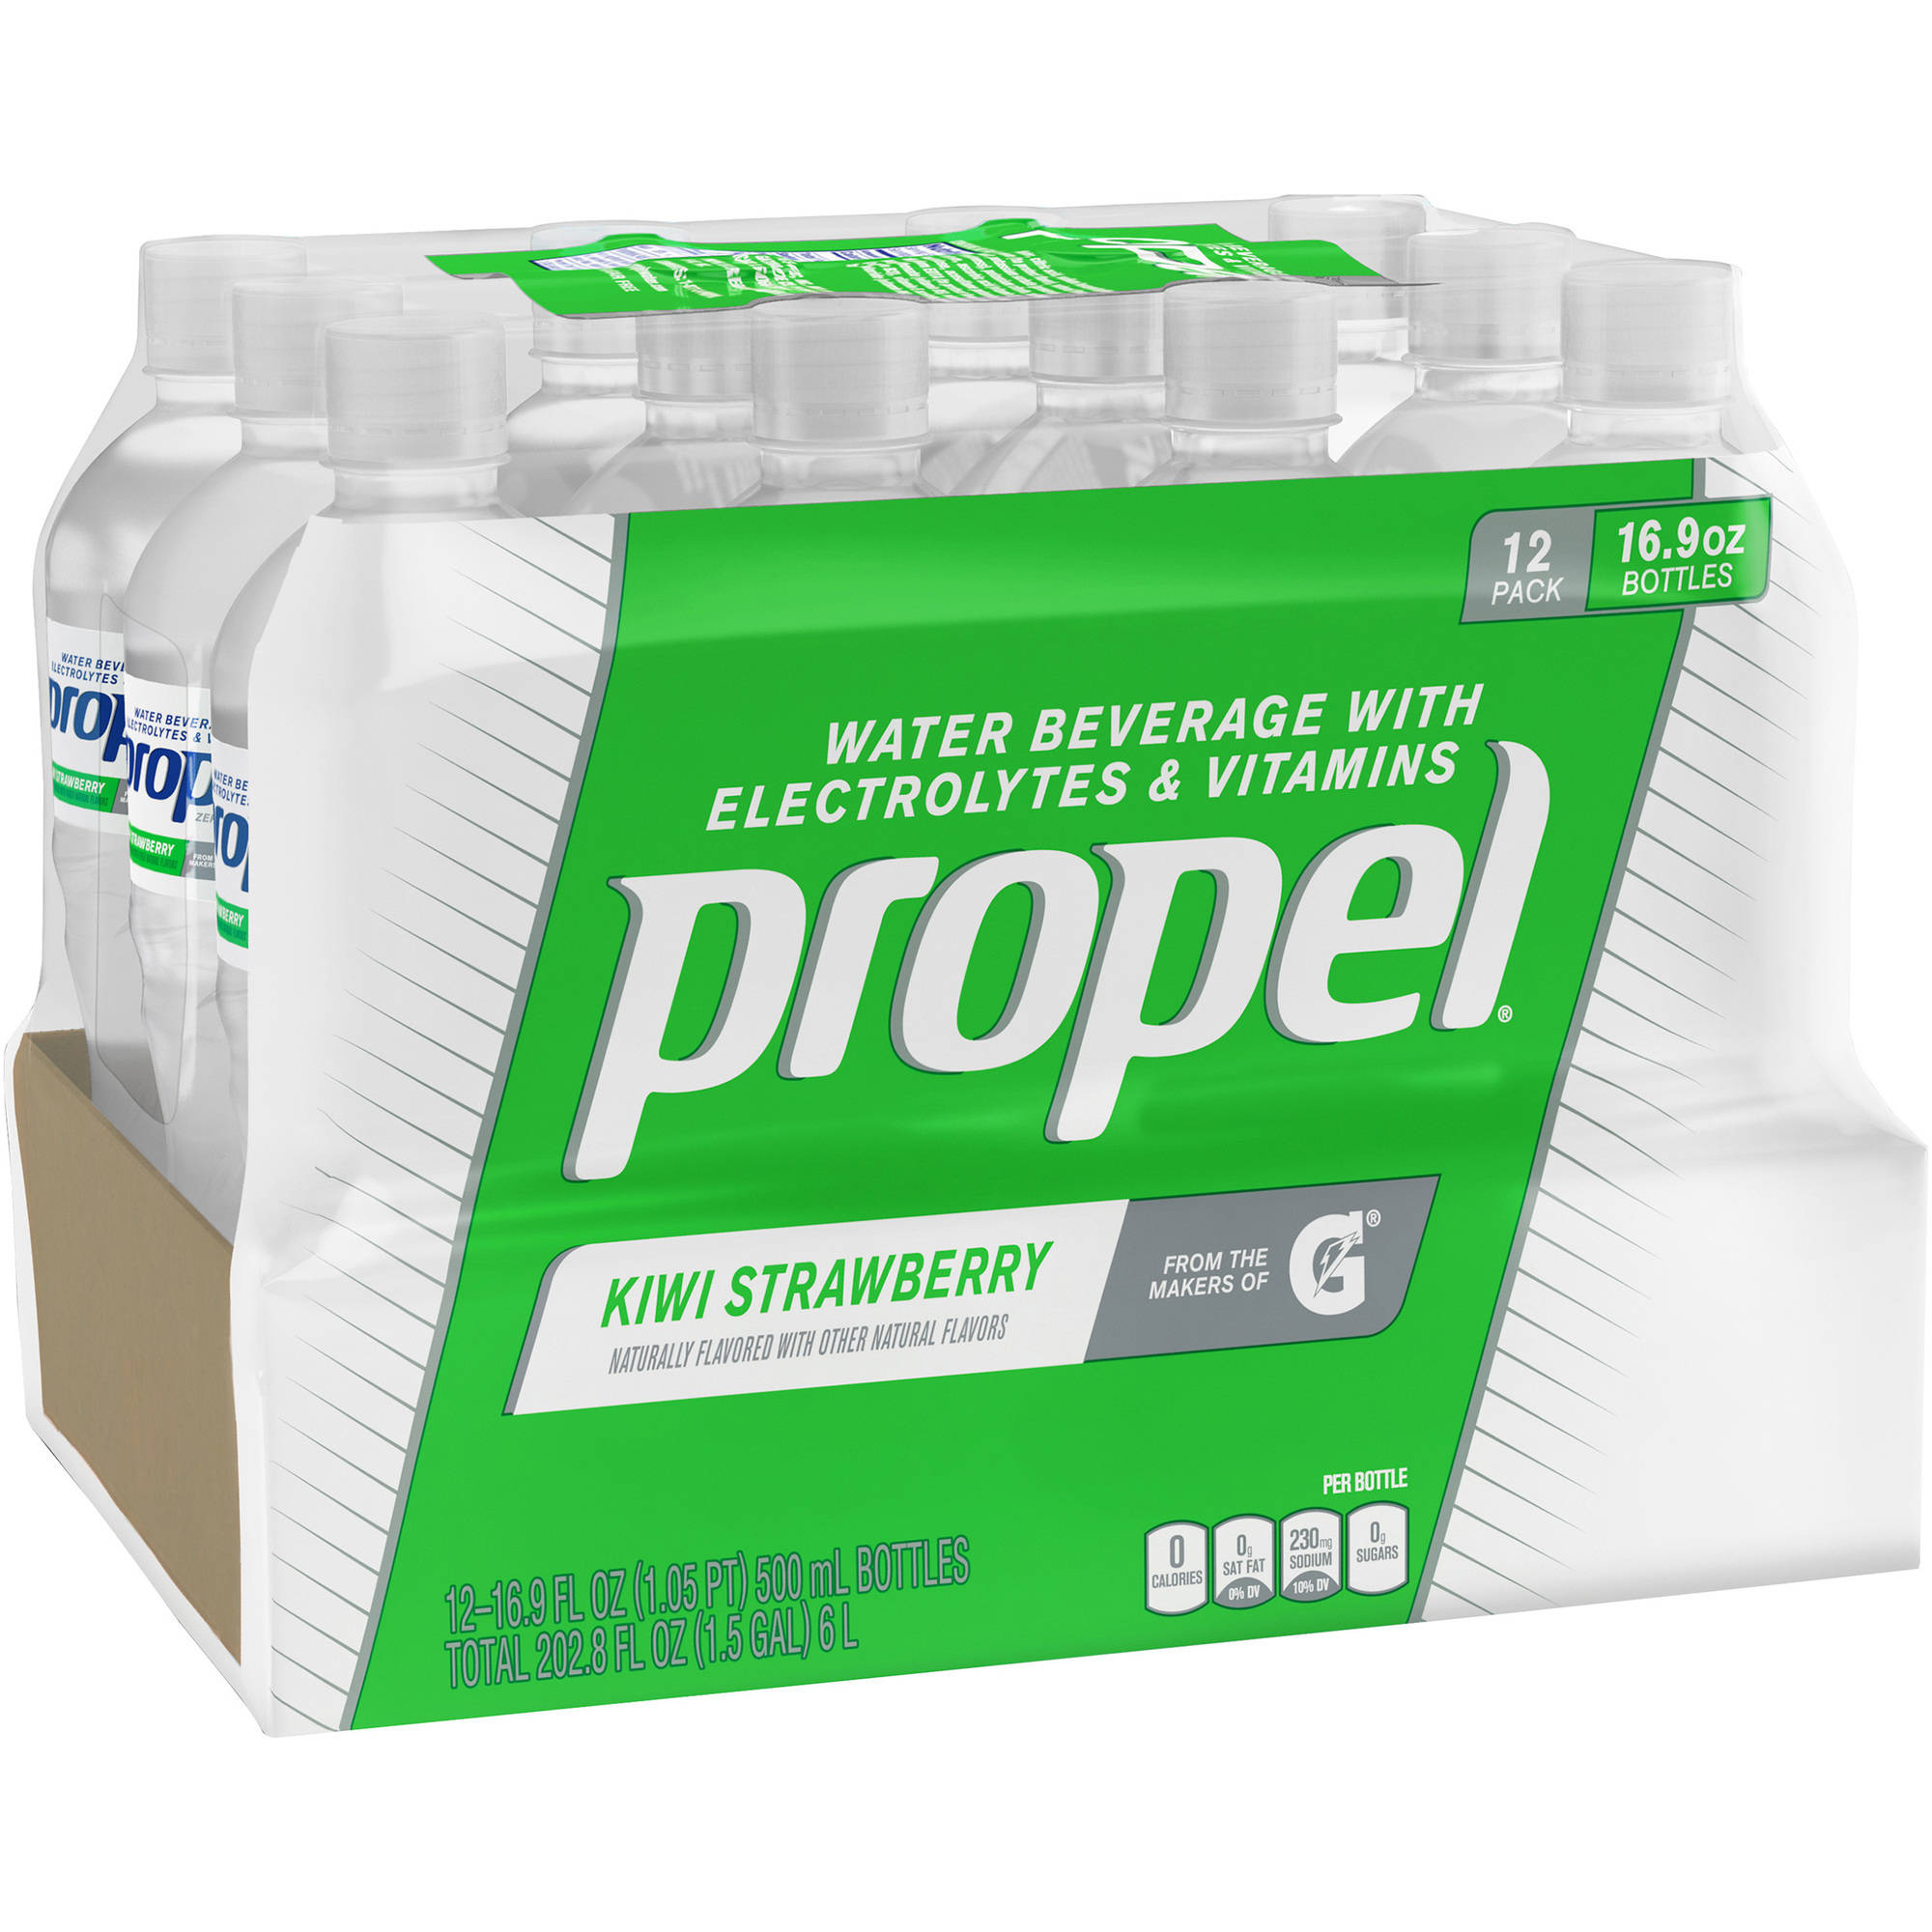 Propel Kiwi Strawberry Water Beverage with Vitamins, 16.9 fl oz, 12 pack